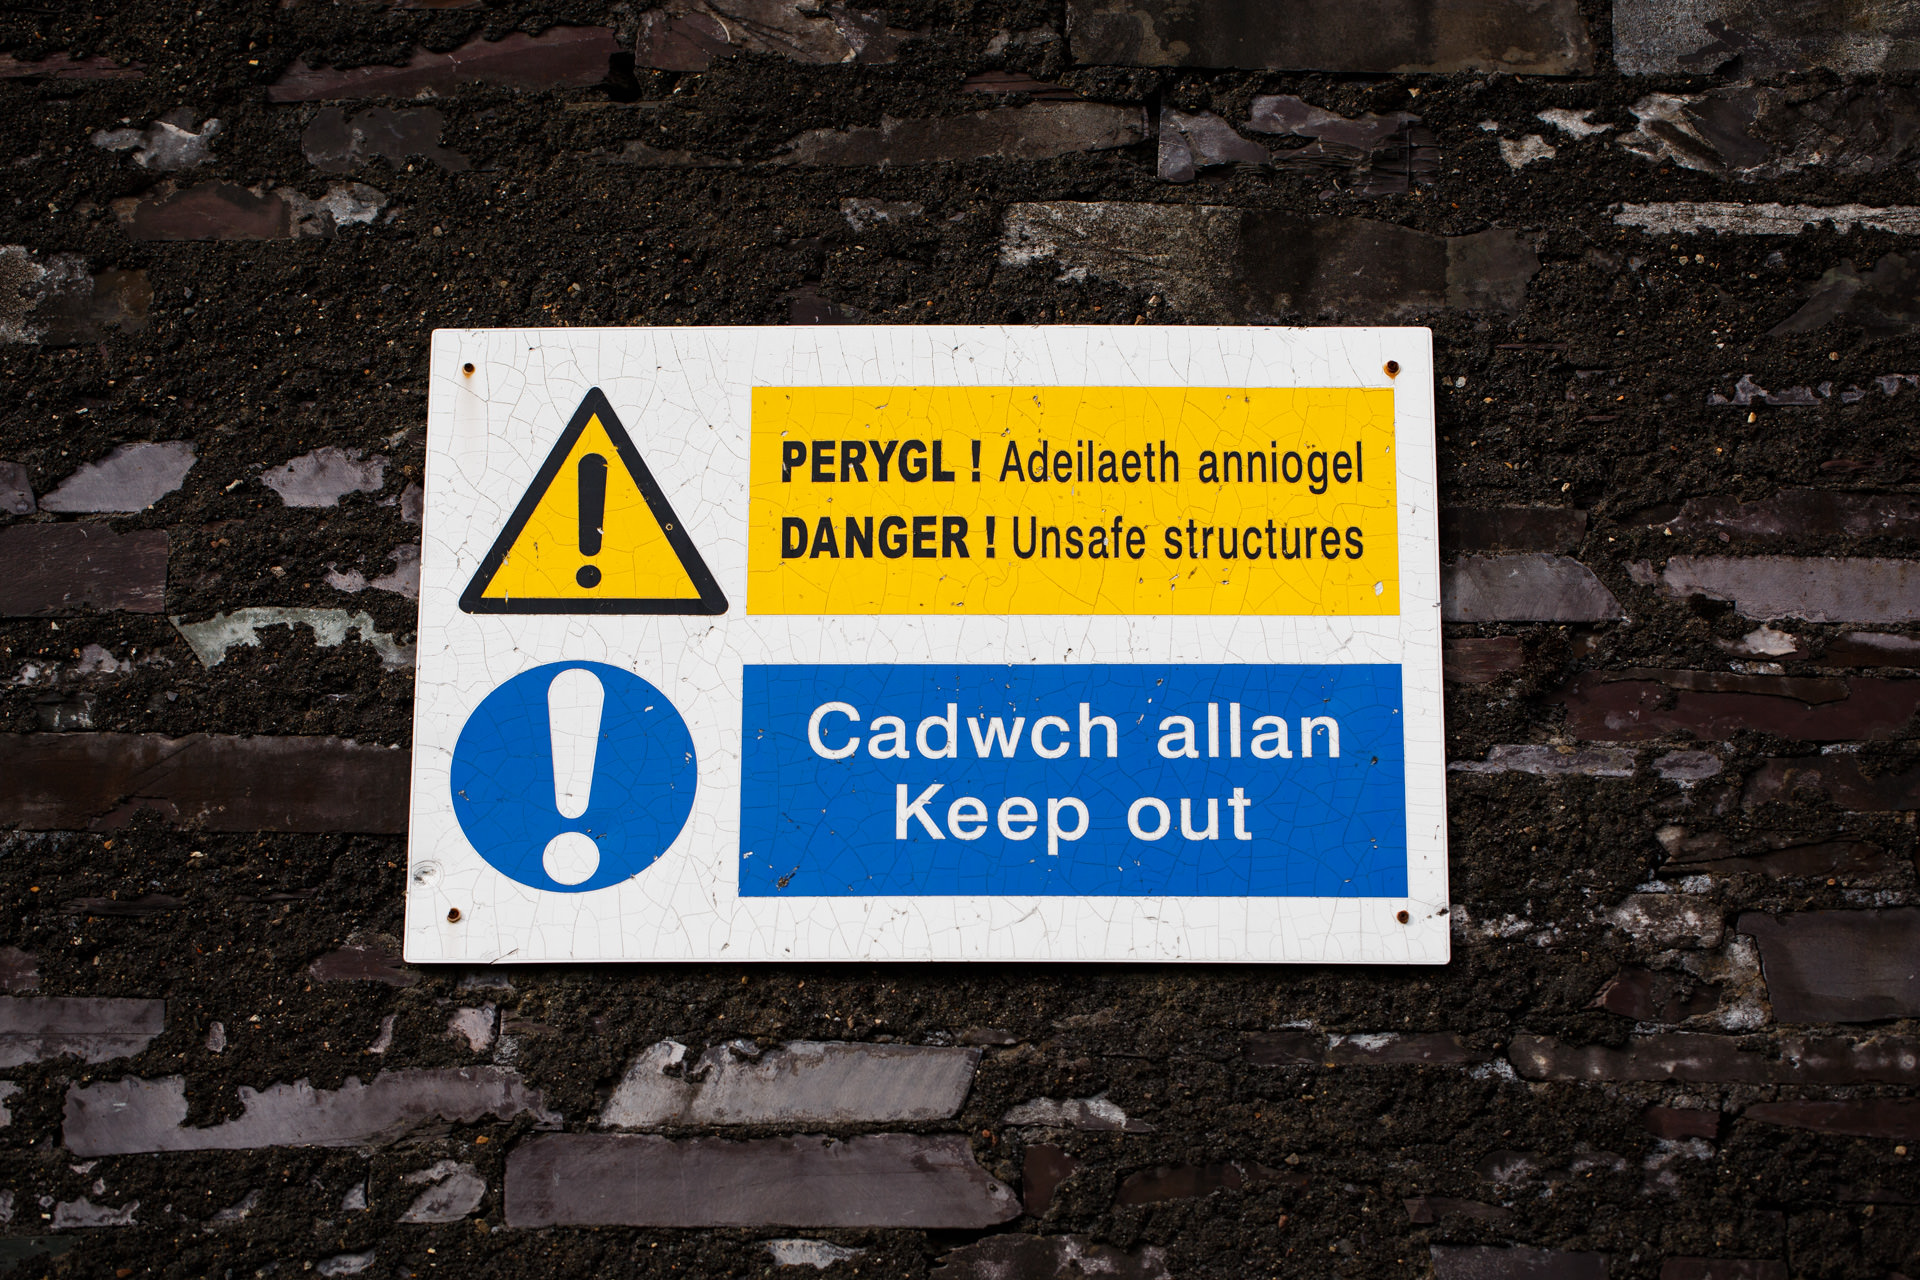 Cymraeg / English